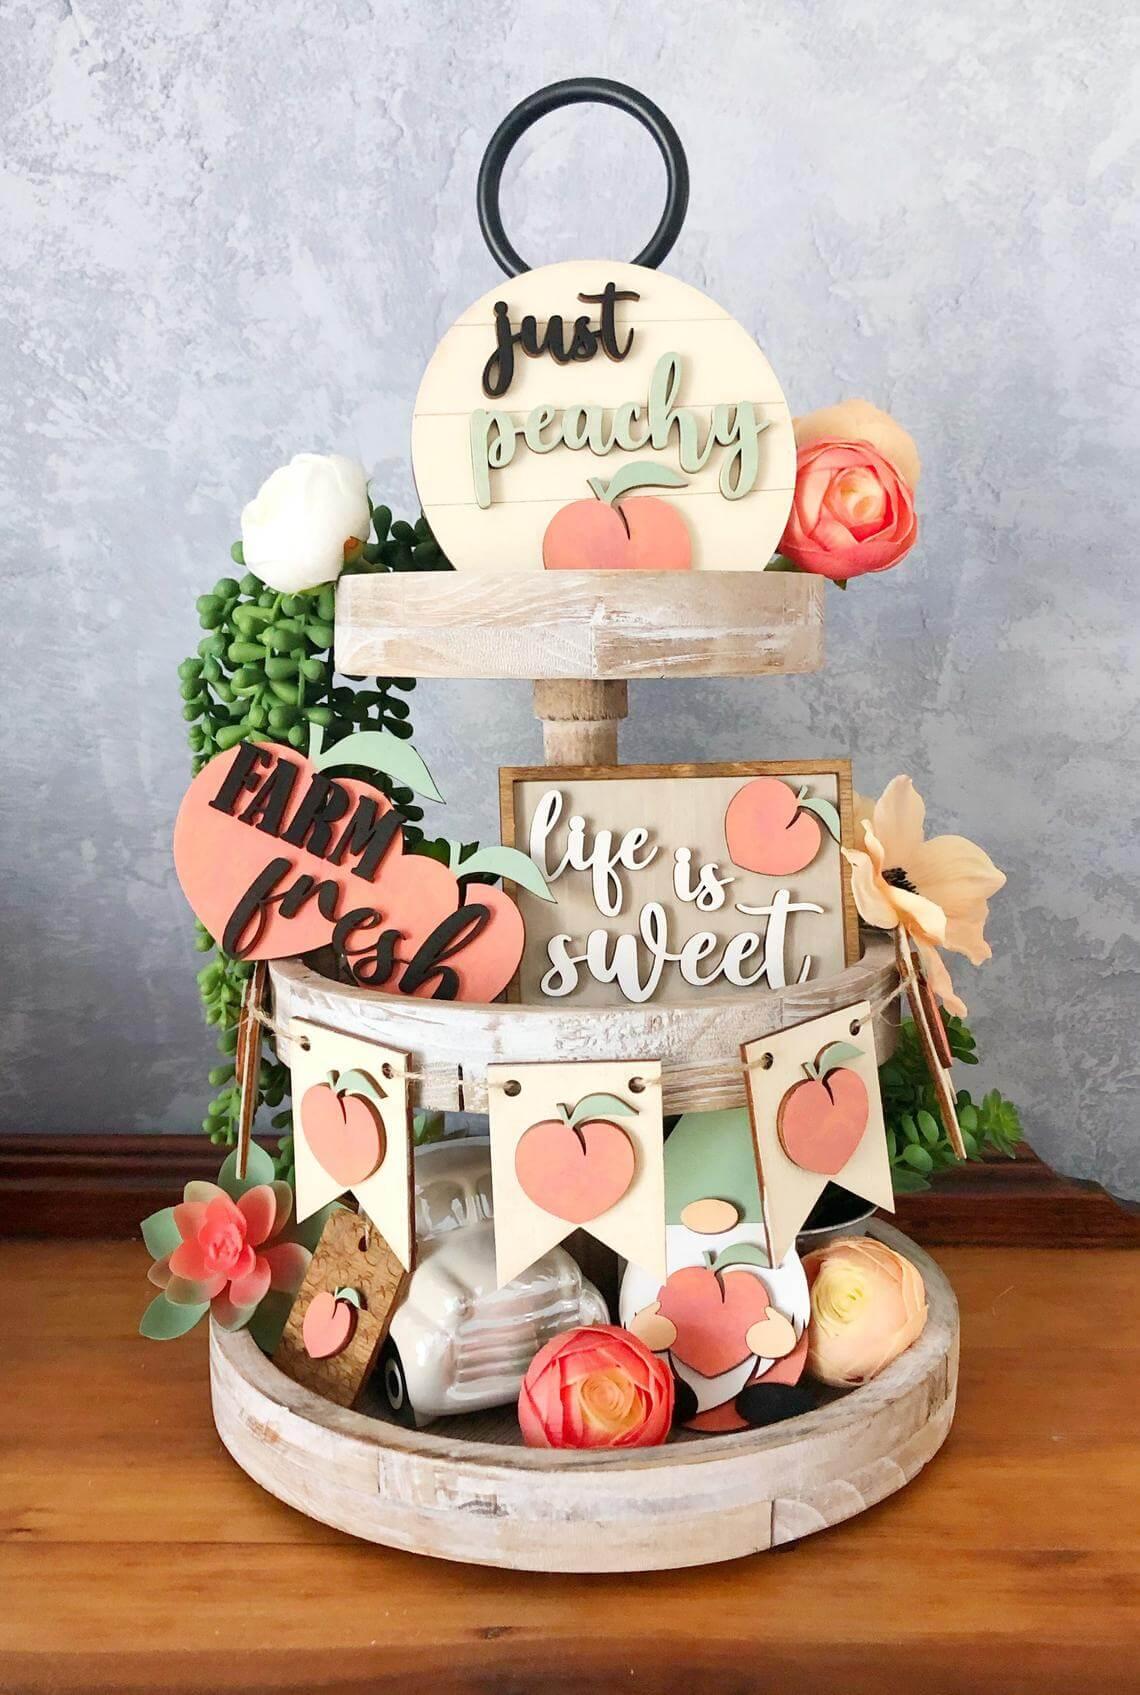 Peach Themed Summer Tiered Tray Décor